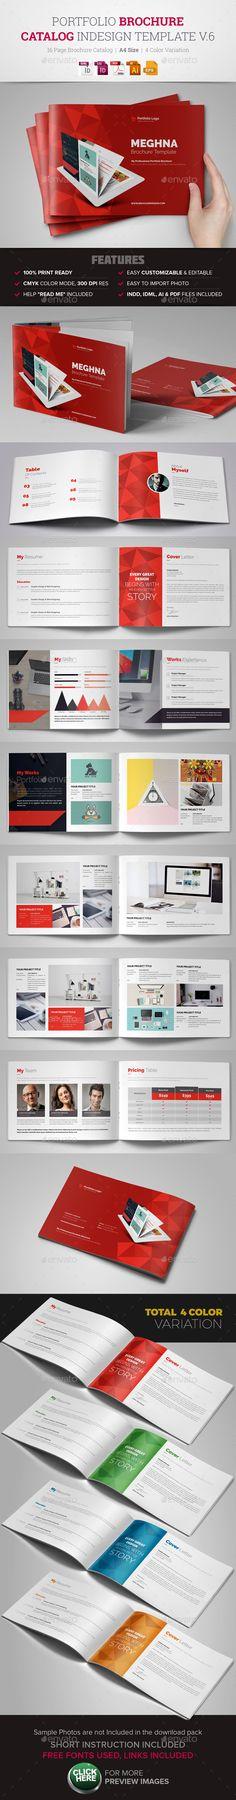 Portfolio Brochure InDesign Template #design Download: http://graphicriver.net/item/portfolio-brochure-indesign-template-v6/13874293?ref=ksioks